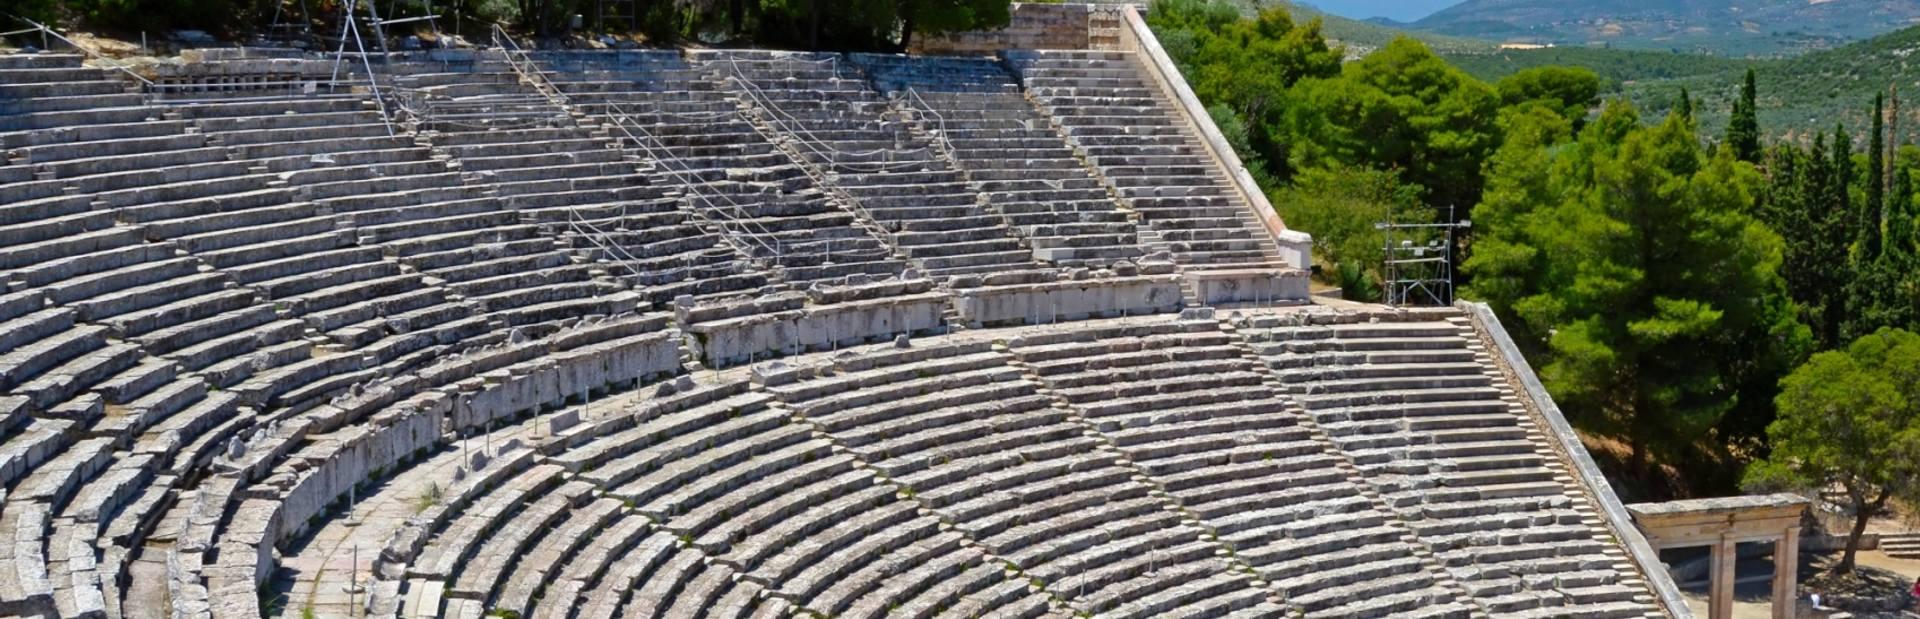 Epidavros inspiration and tips